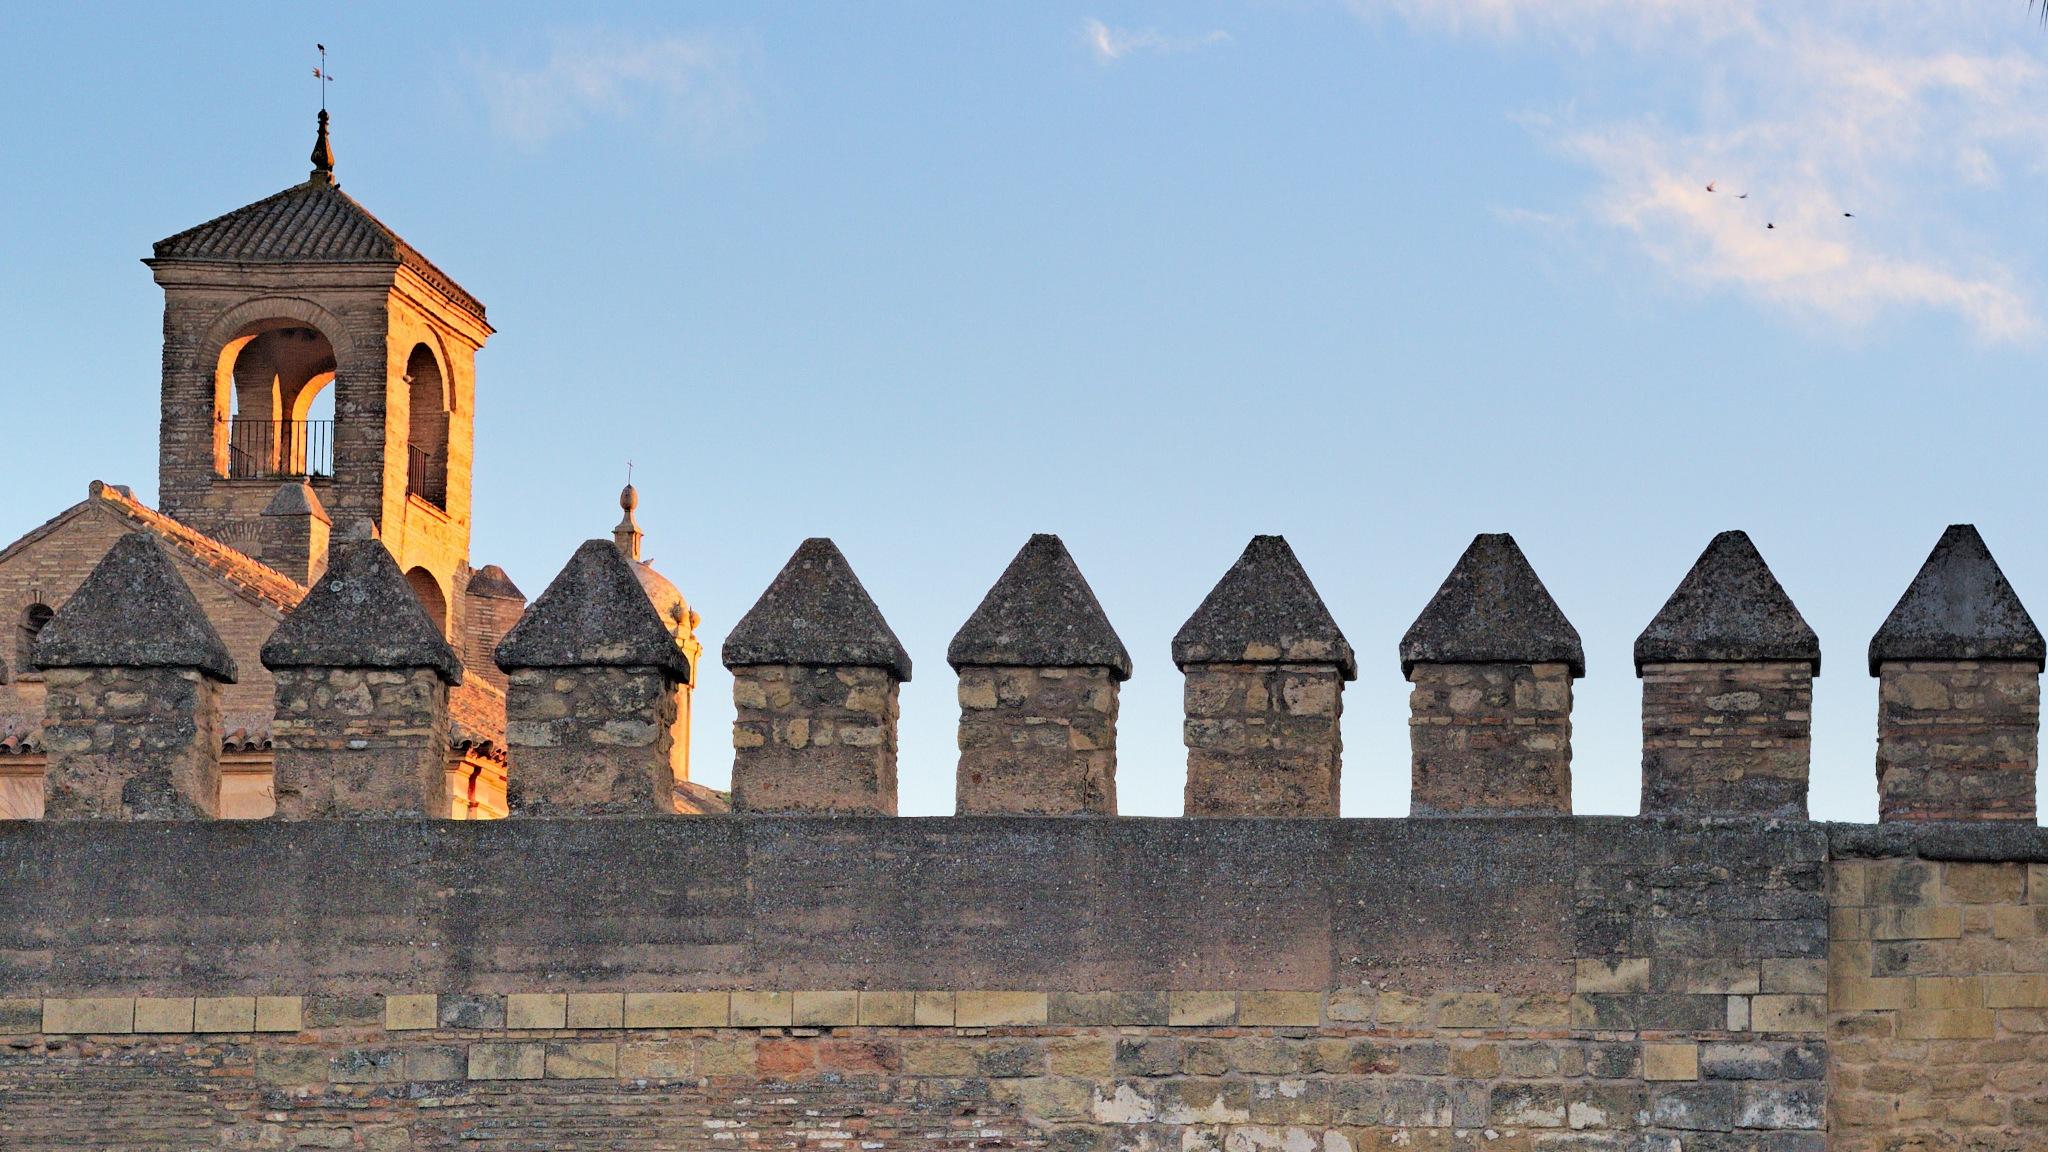 A dawn over the walls of Alcazar by Alexey Zalesny